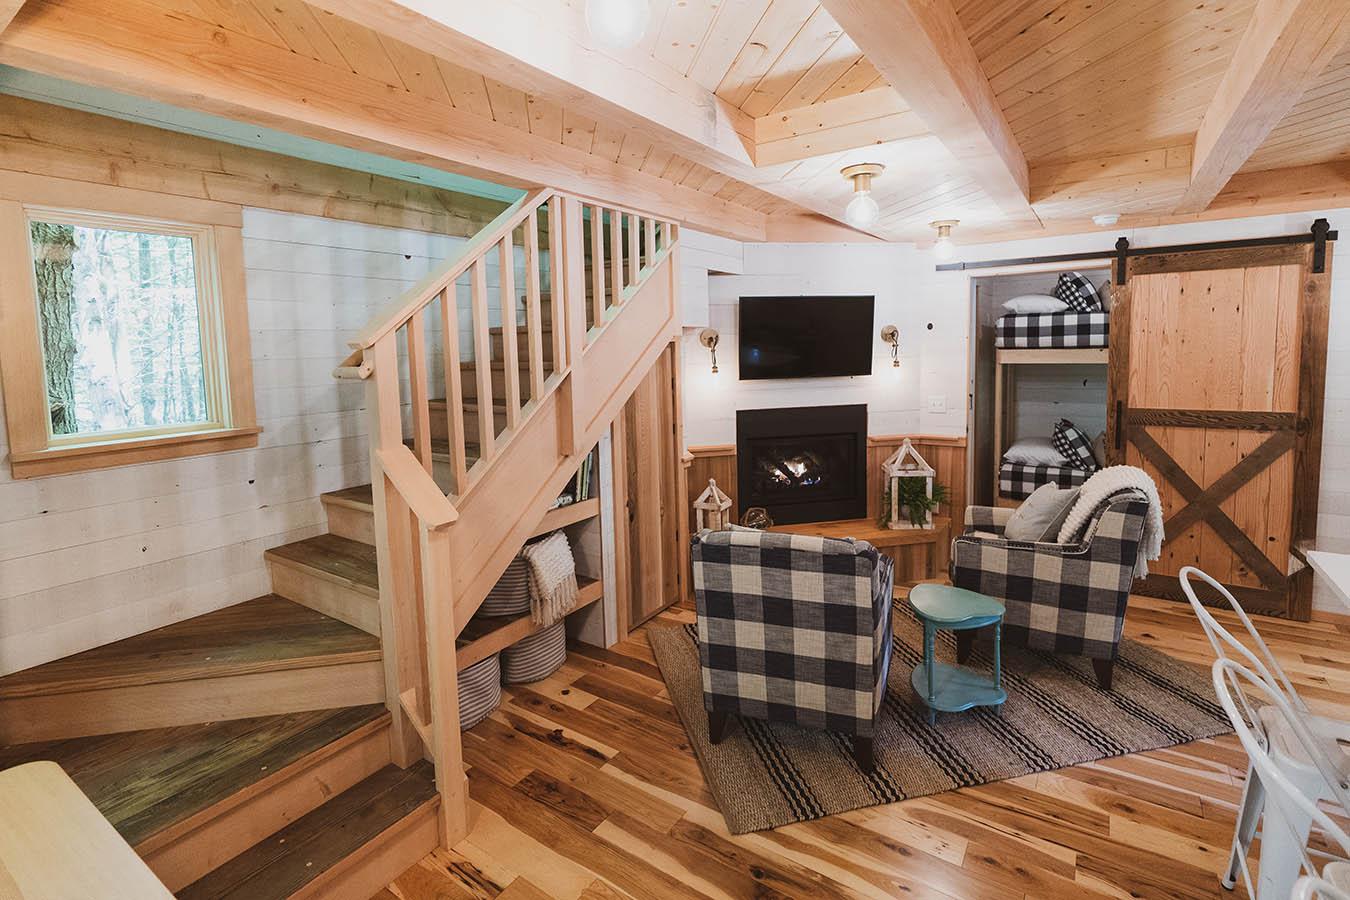 Woods treehouse 2